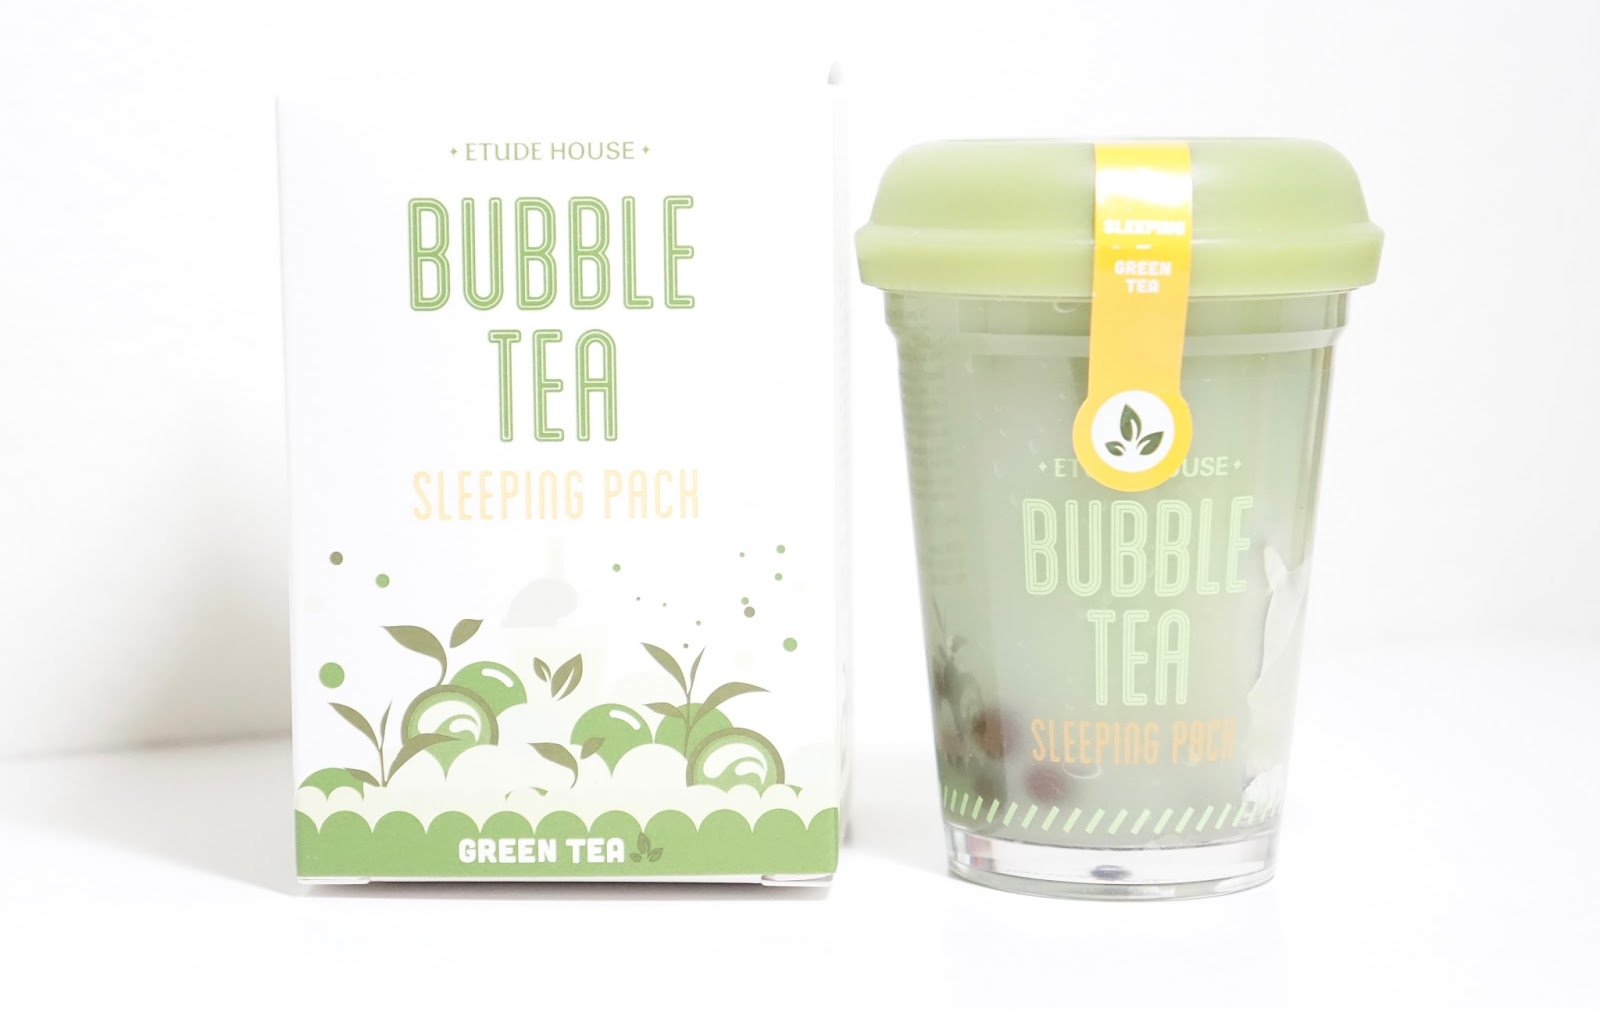 etude house bubble tea sleeping pack review